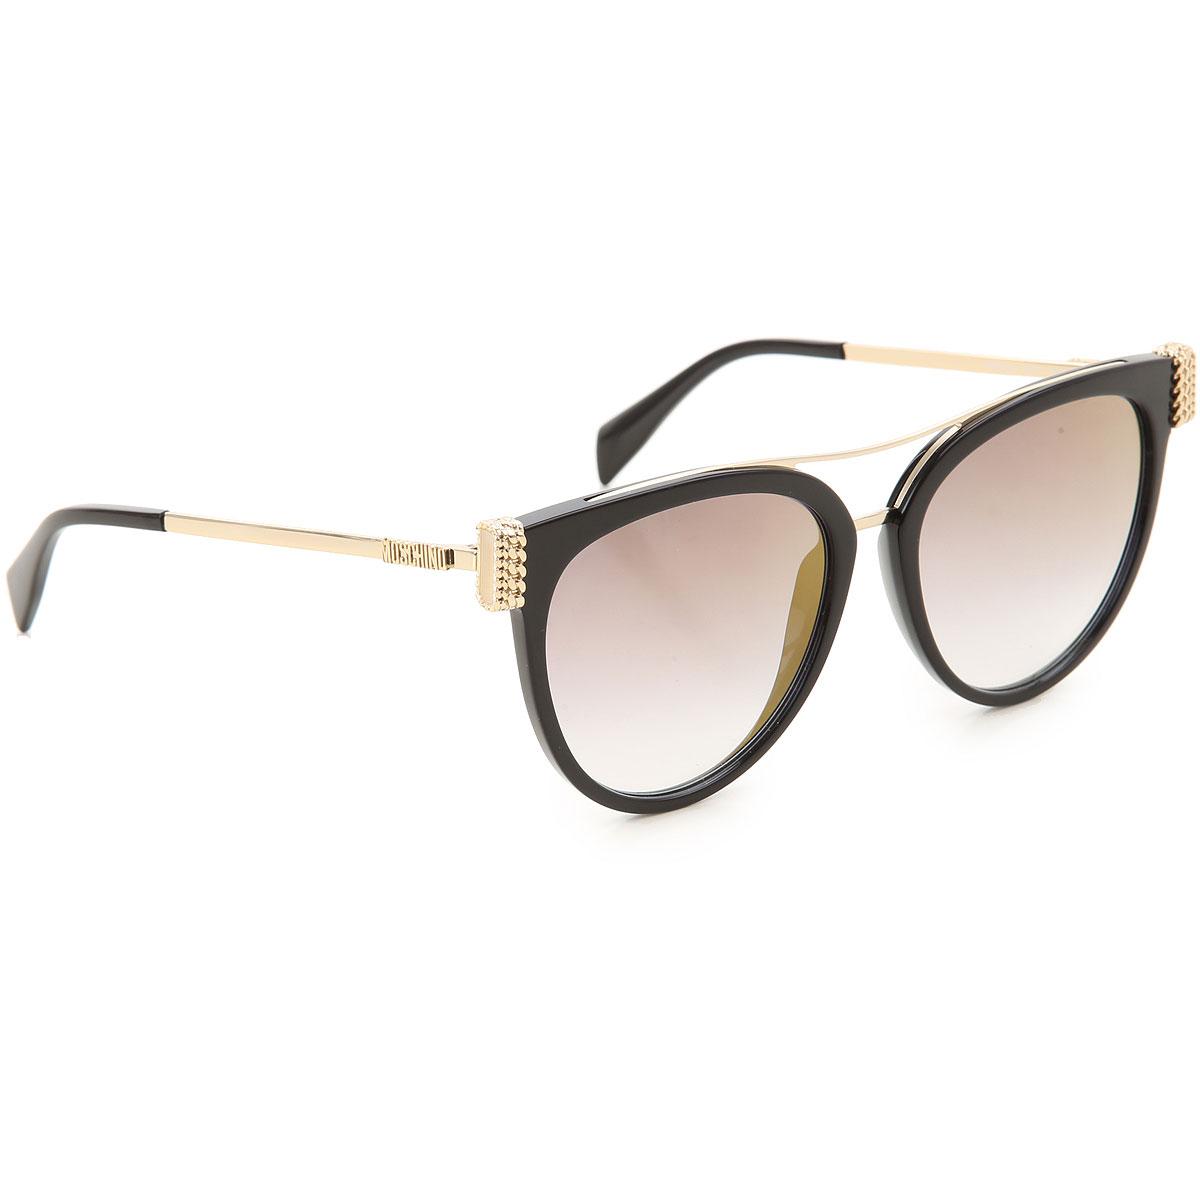 MOSCHINO Sonnenbrille | Moschino Sonnenbrillen, Schwarz, 2017